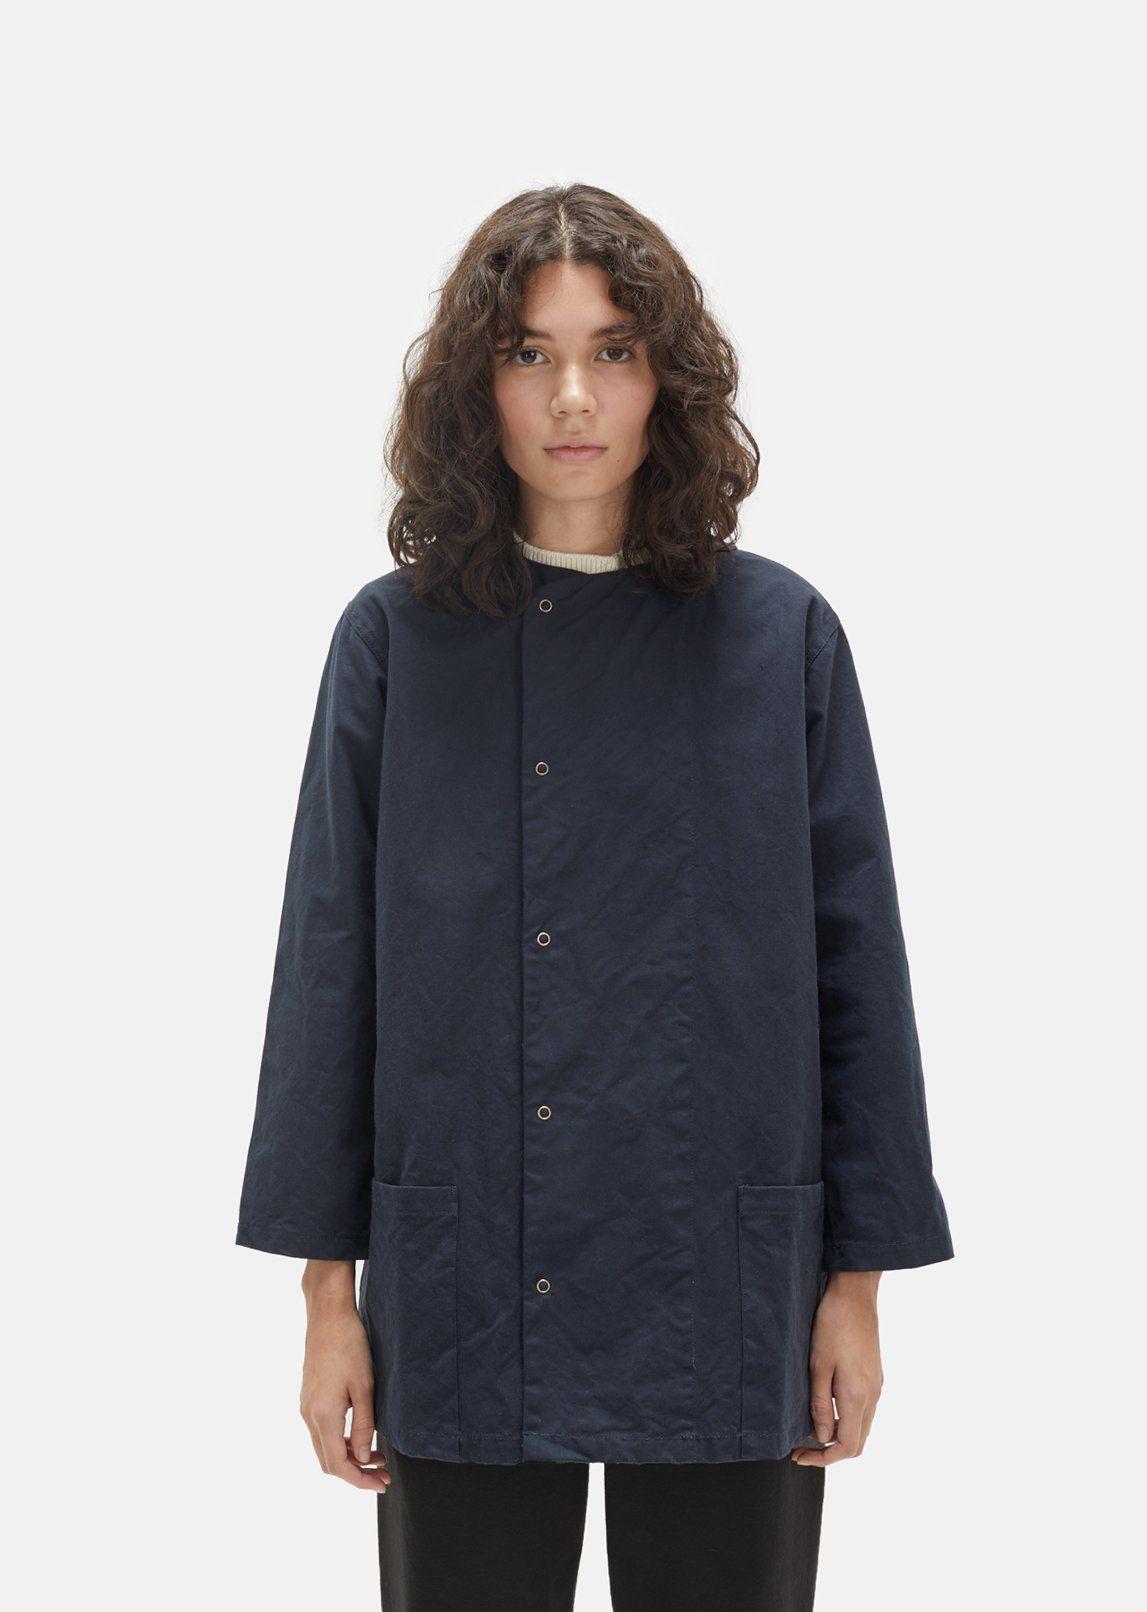 Military canvas snap front shirt jacket shirt jacket cotton